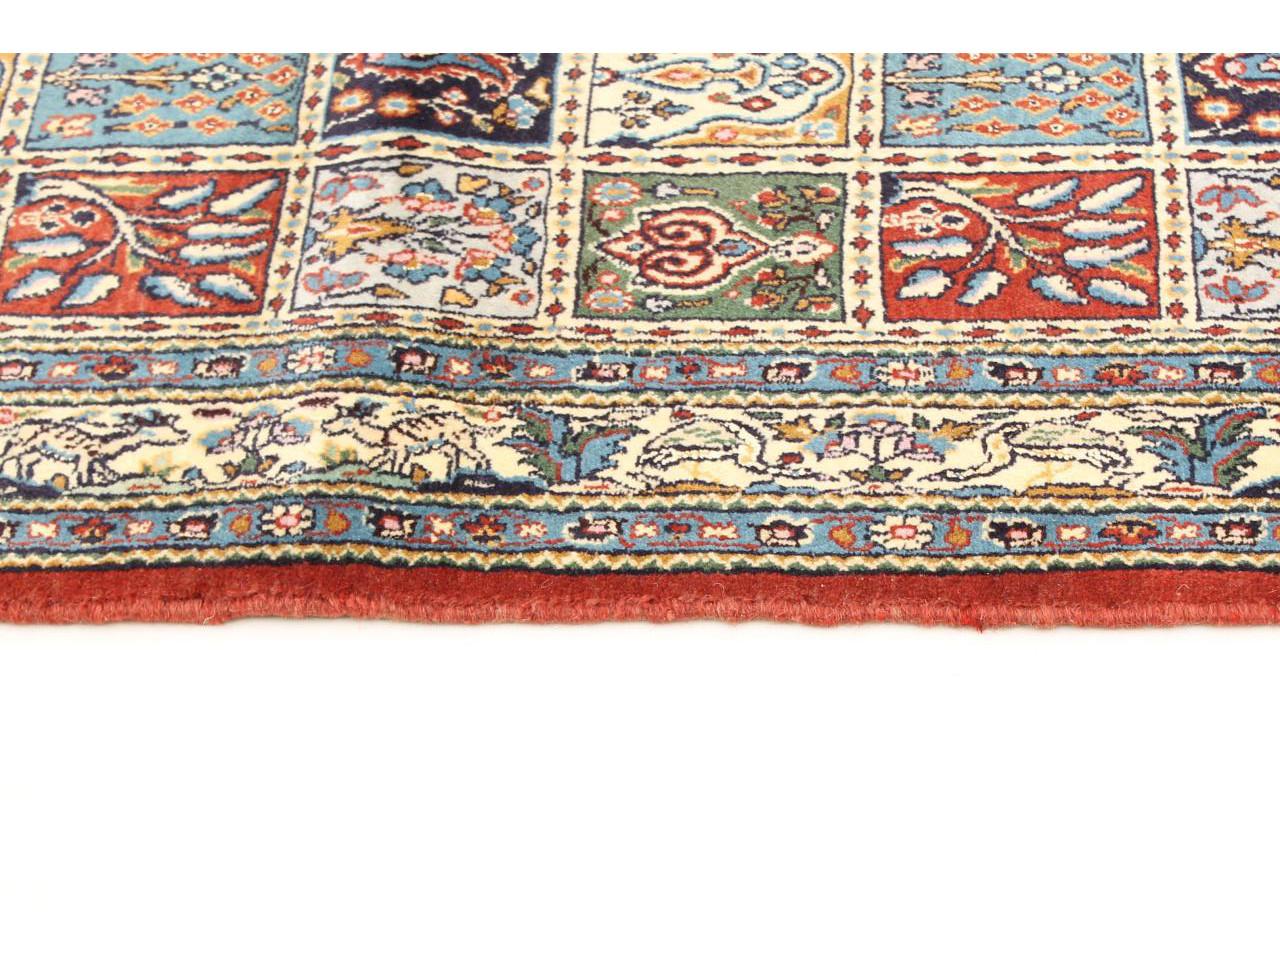 moud jardin tapis persans n 27551 145x100cm. Black Bedroom Furniture Sets. Home Design Ideas